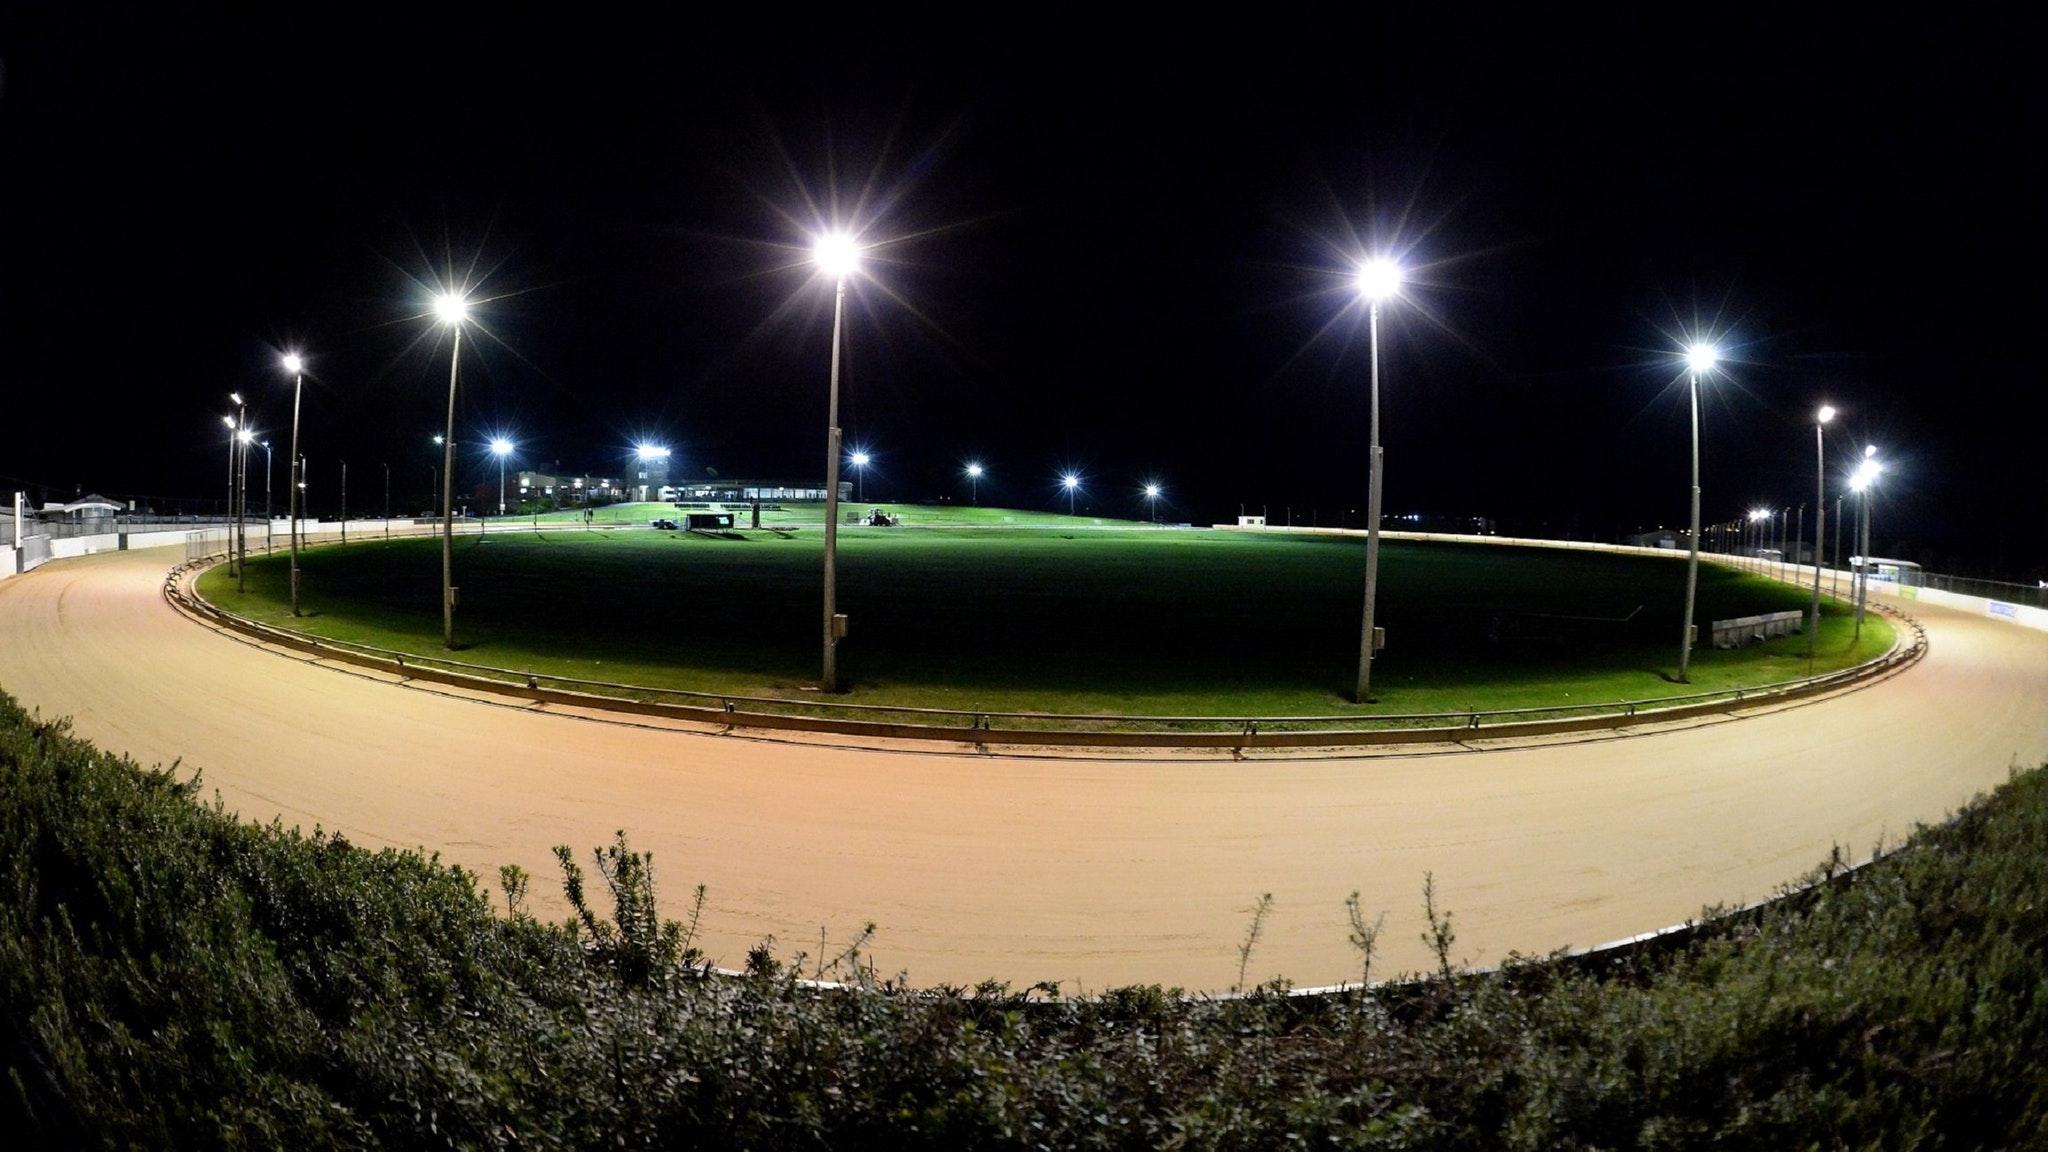 Warrnambool Greyhounds - Racing under lights every Thursday